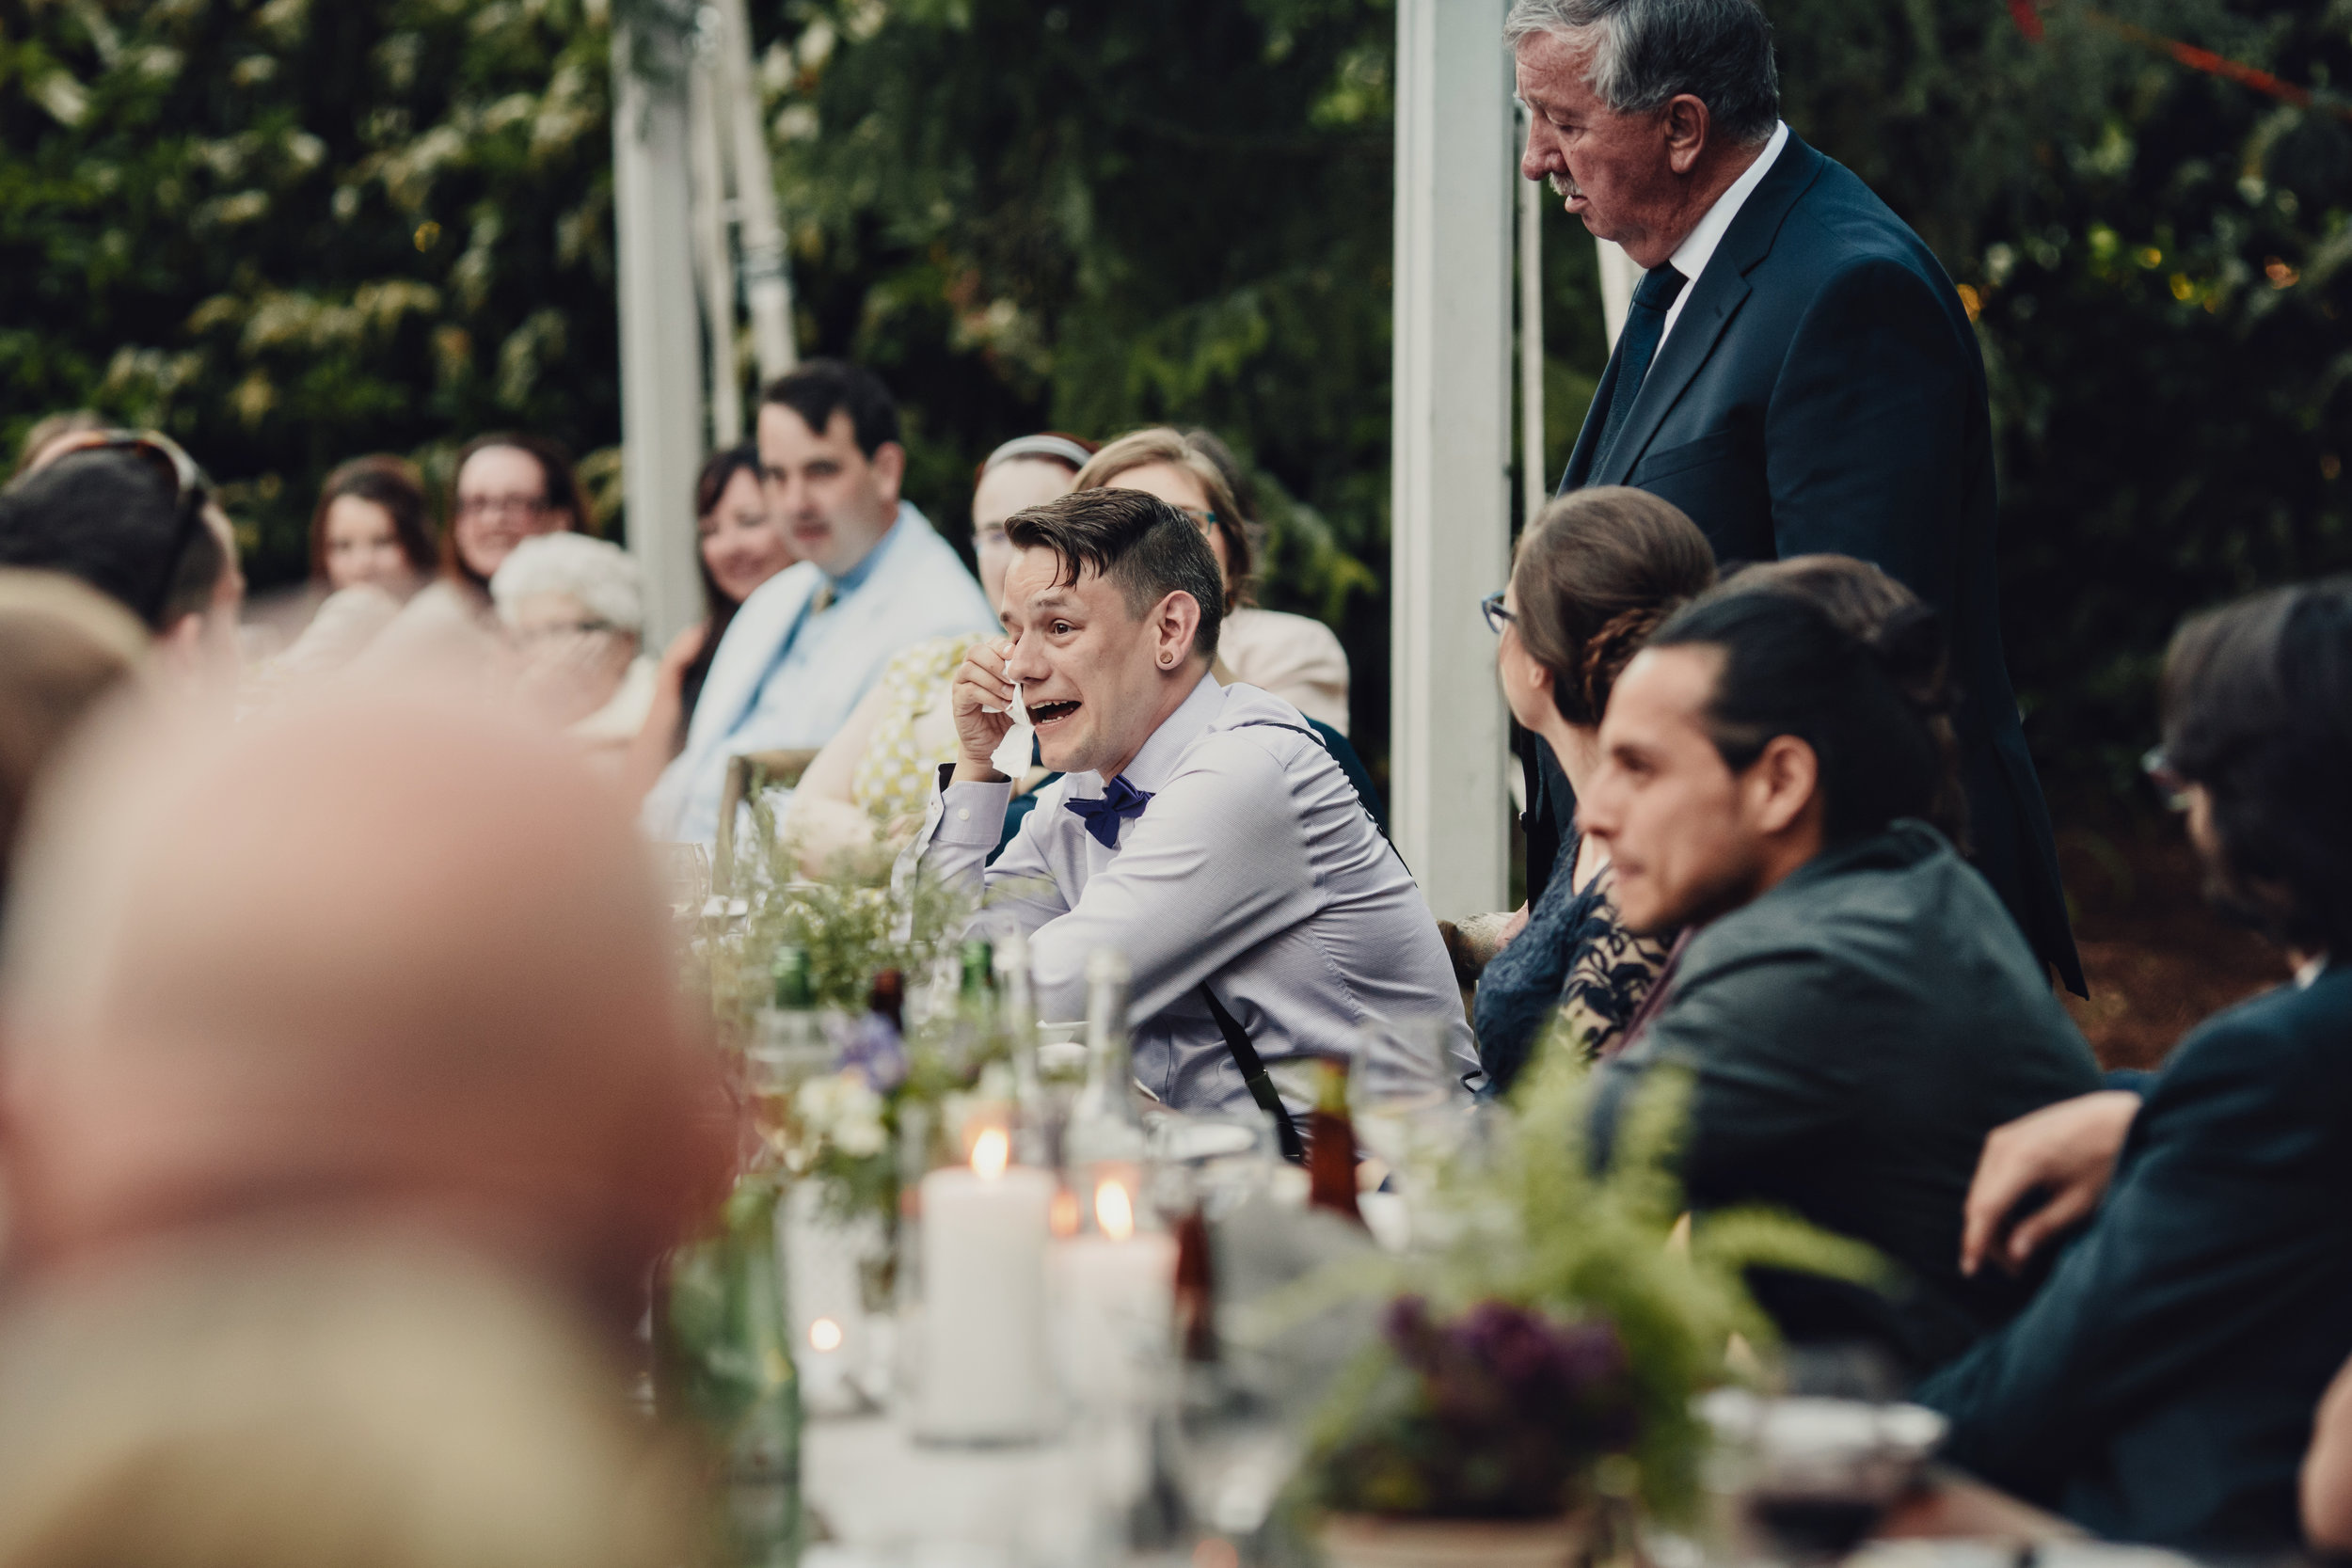 same-sex-wedding-photos-36.jpg